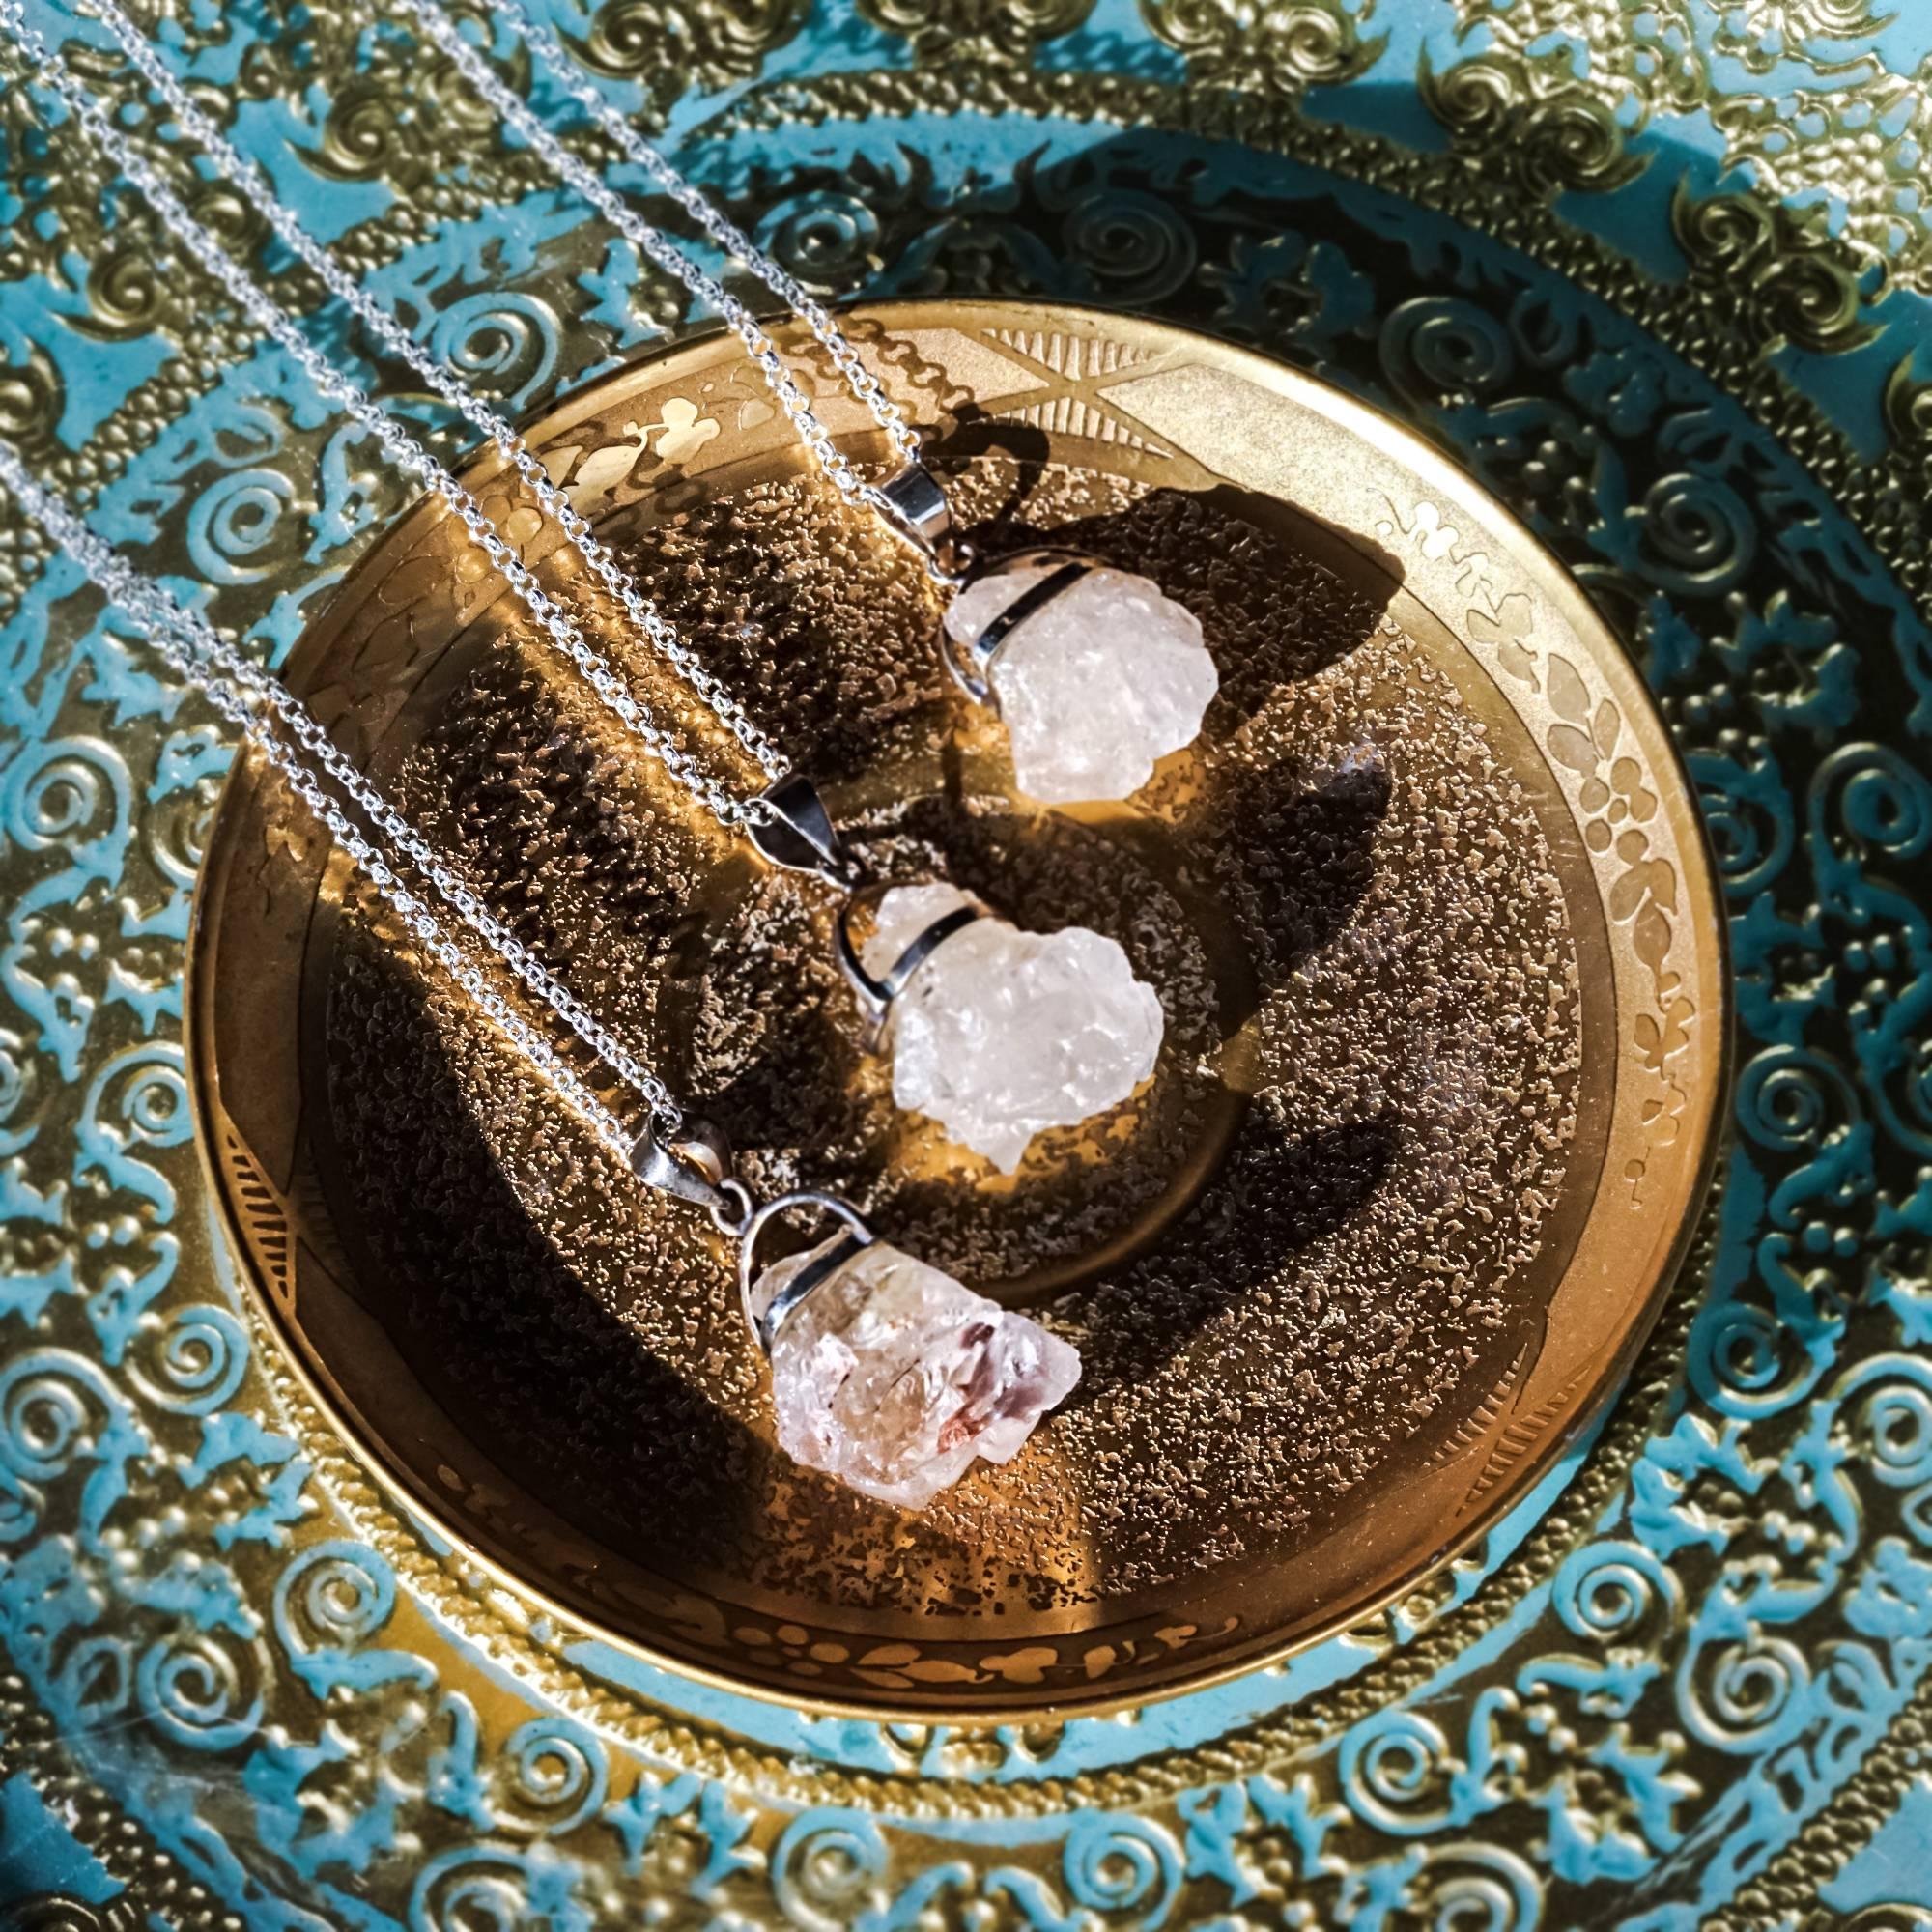 nirvana quartz necklaces